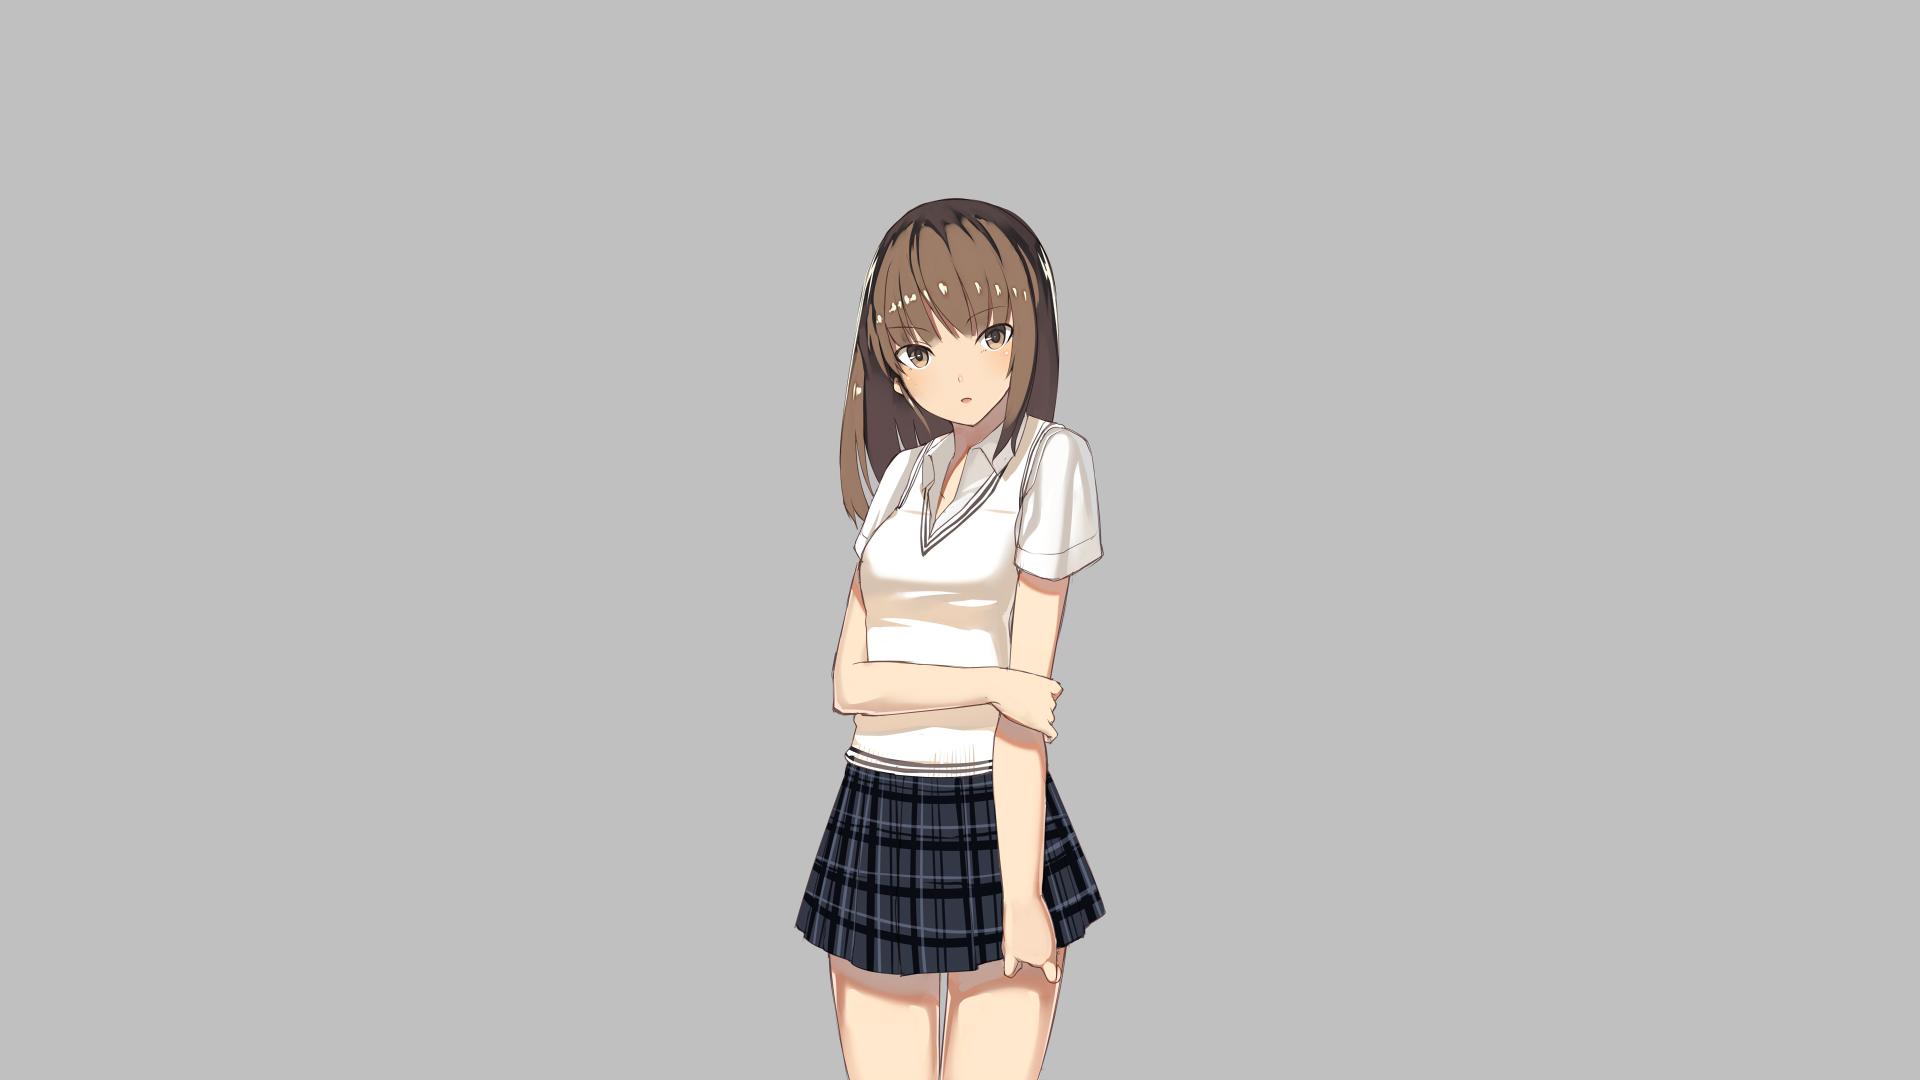 Anime 1920x1080 anime girls anime original characters schoolgirl miniskirt looking at viewer blushing gray background minimalism simple background artwork 2D illustration